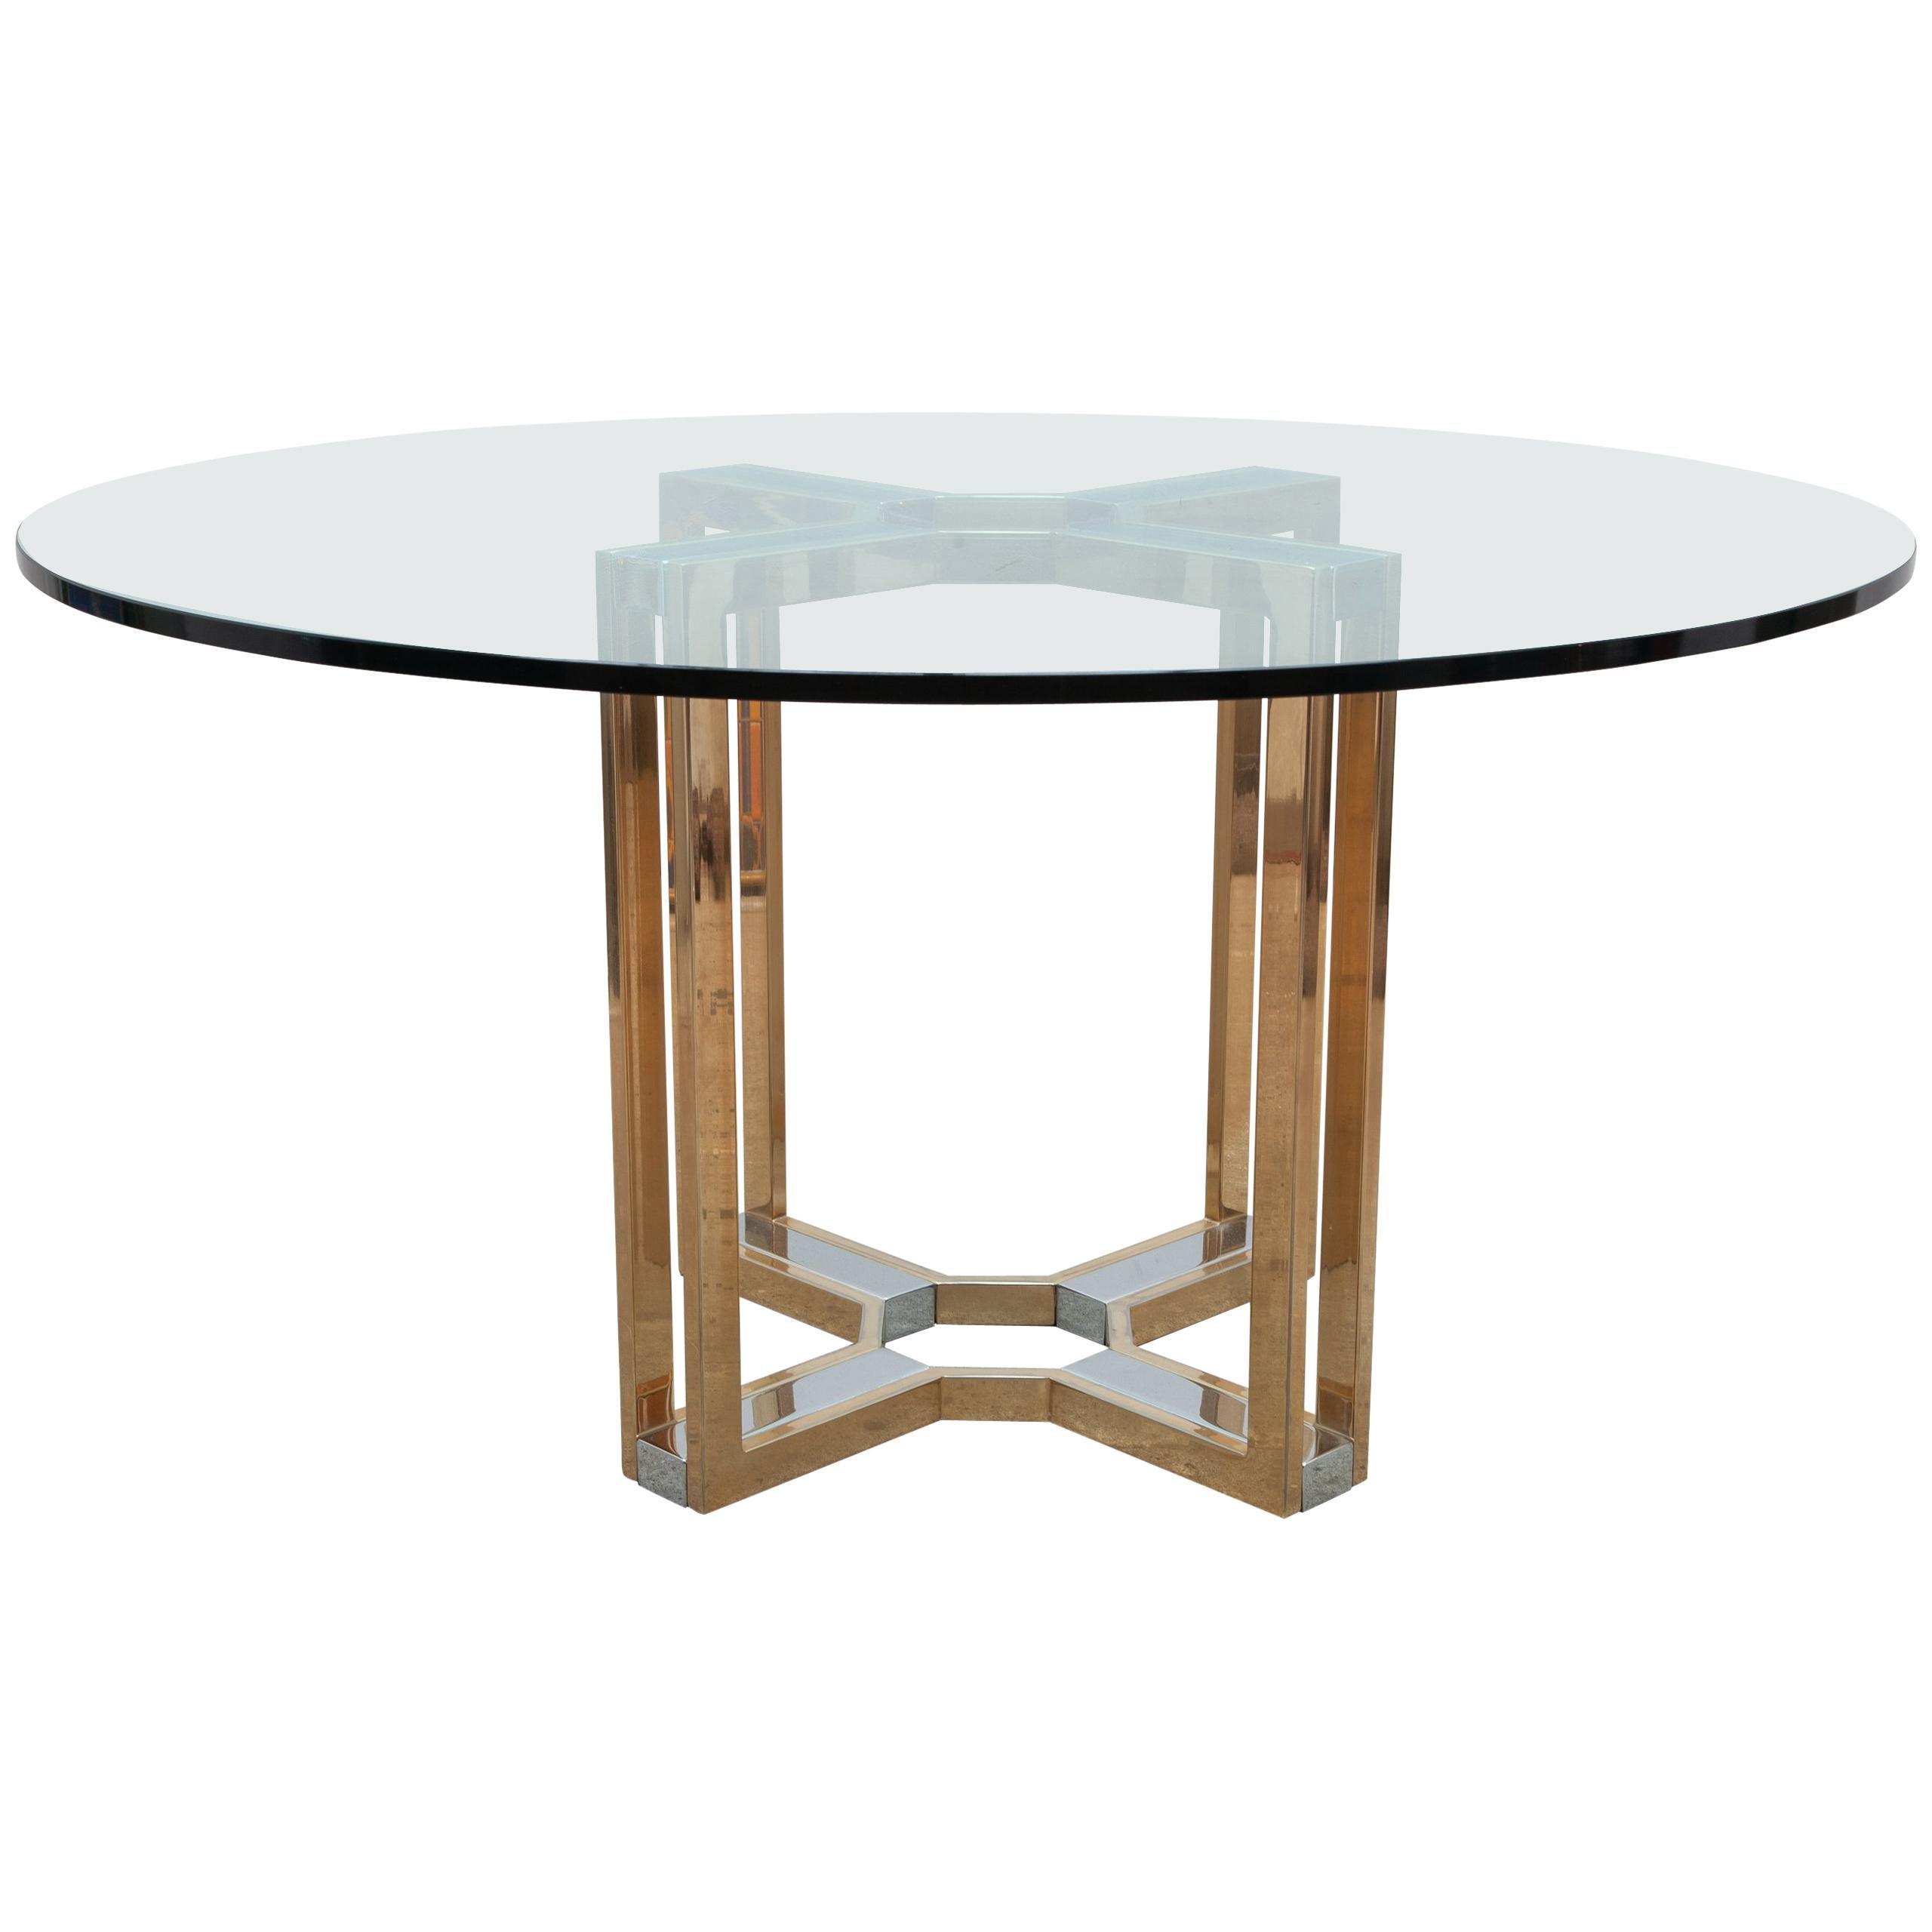 Romeo Rega Gold and Chrome Round Glass Top Centre Table